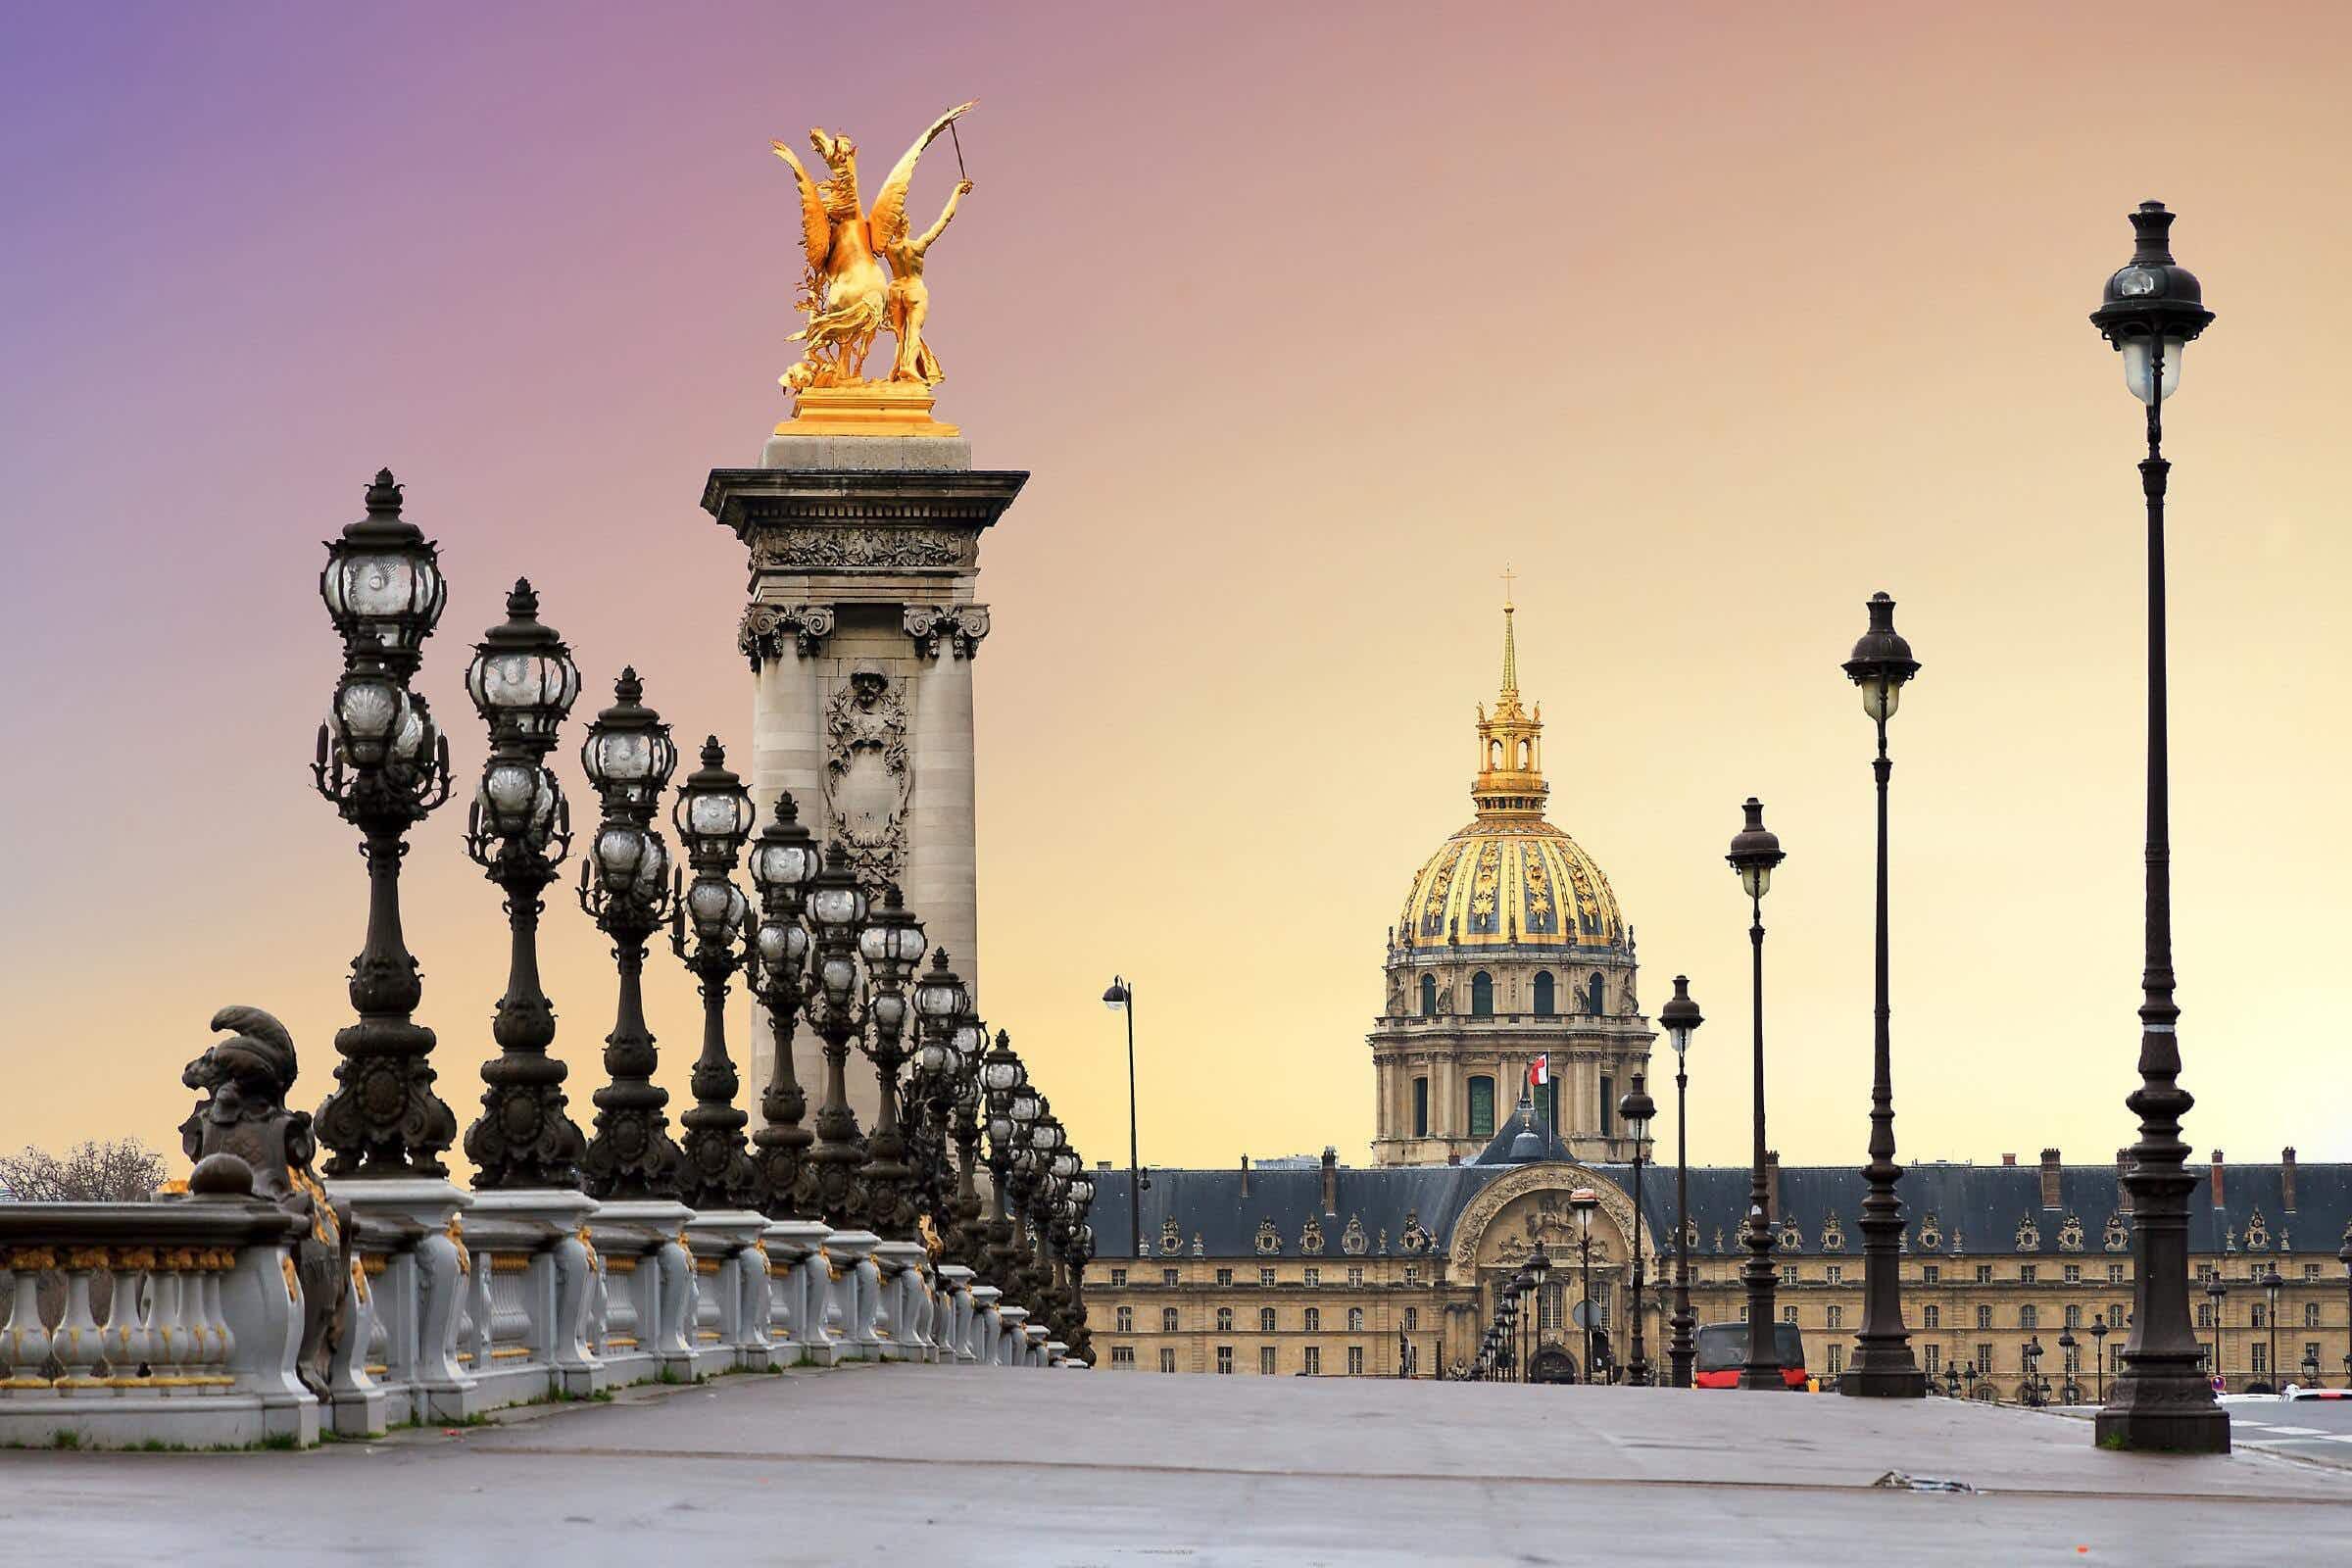 Paris is getting three new footbridges full of shops, restaurants and gardens